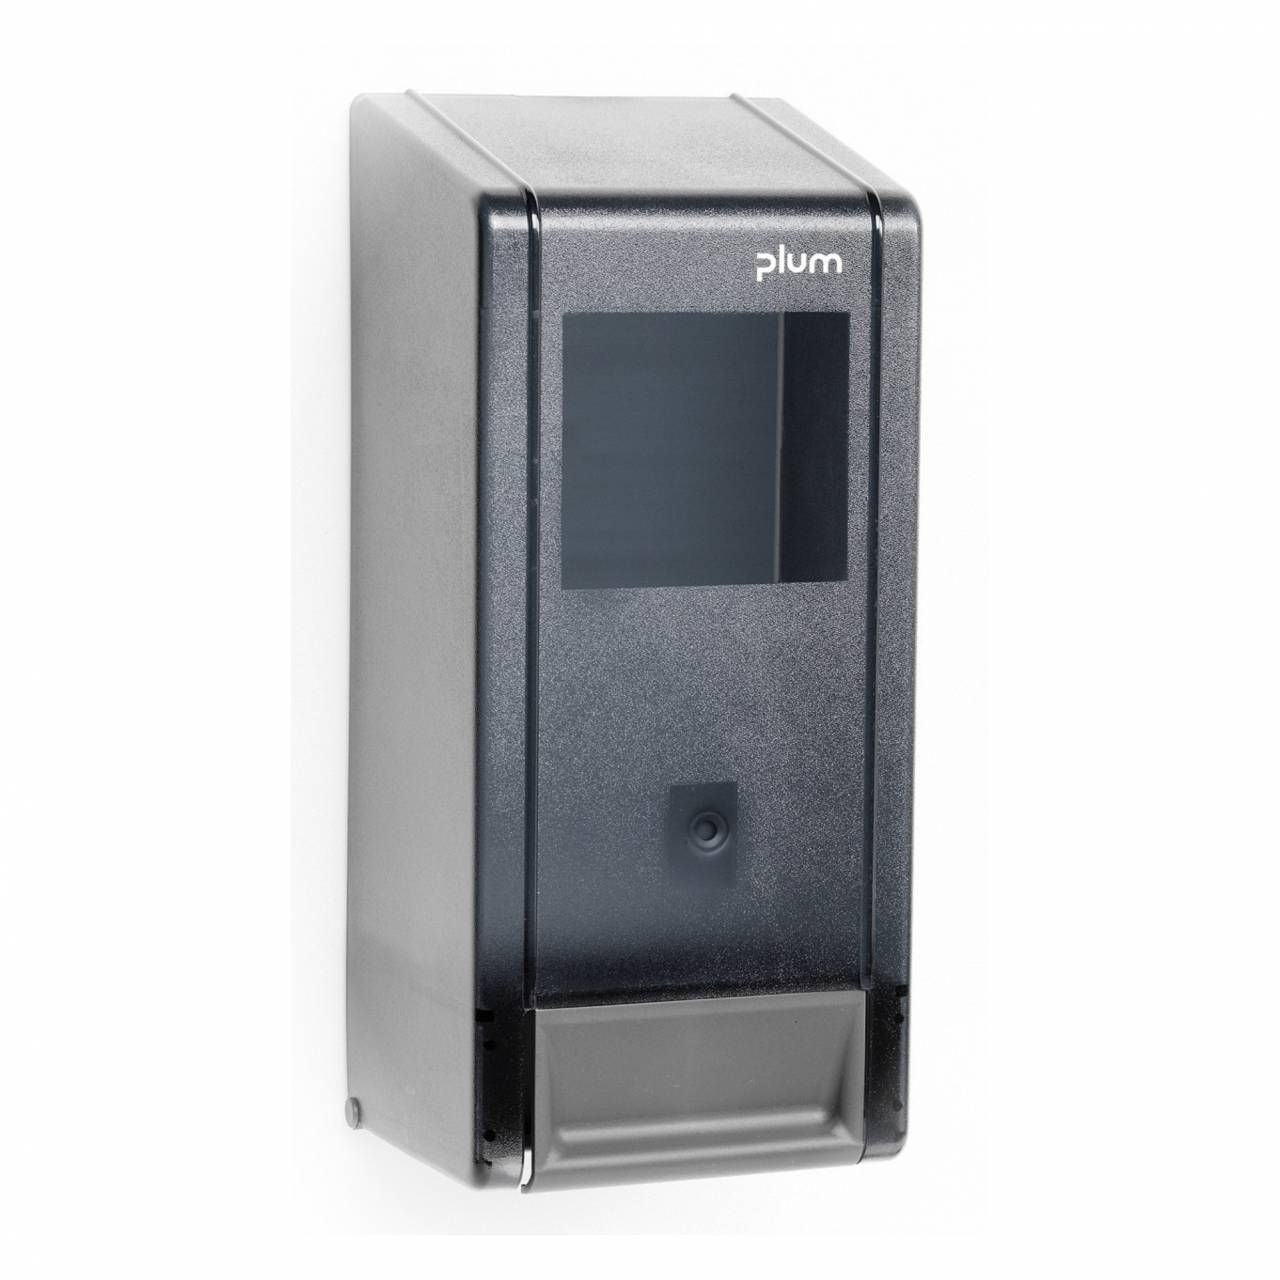 Plum® Spendersystem MP2000 Modul-1 300 x 130 x 100 mm